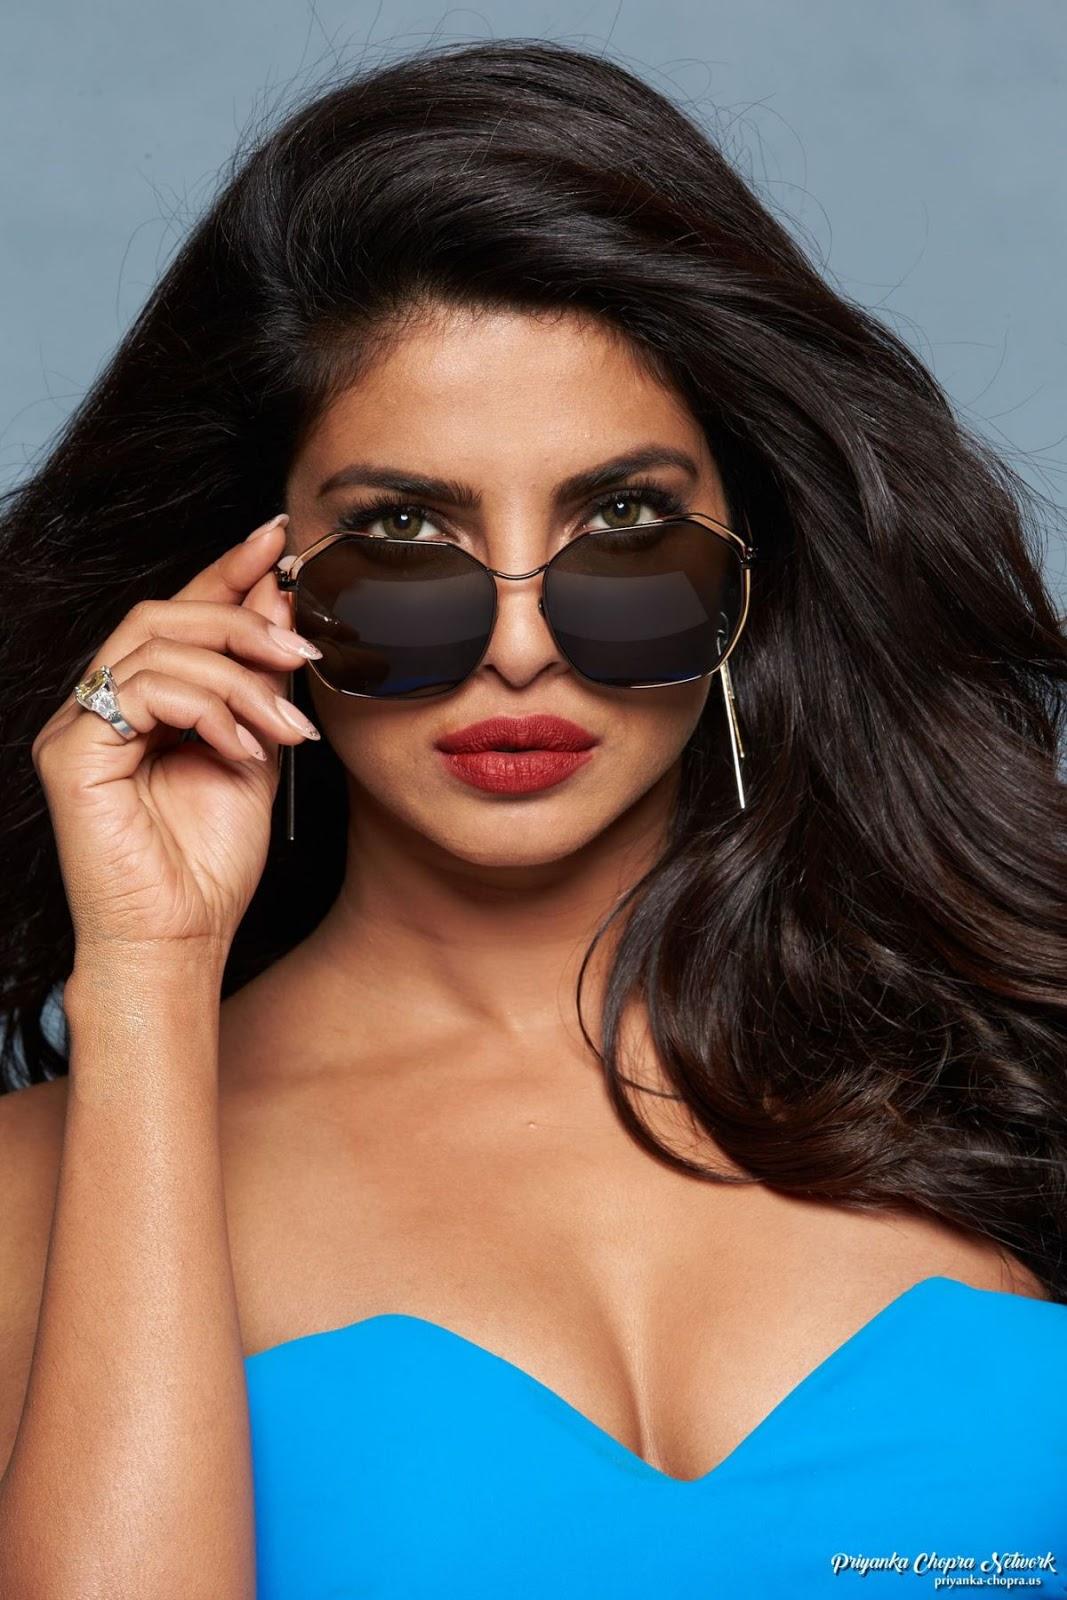 Priyanka Chopra Sizzles In Blue Gown For Baywatch Promo